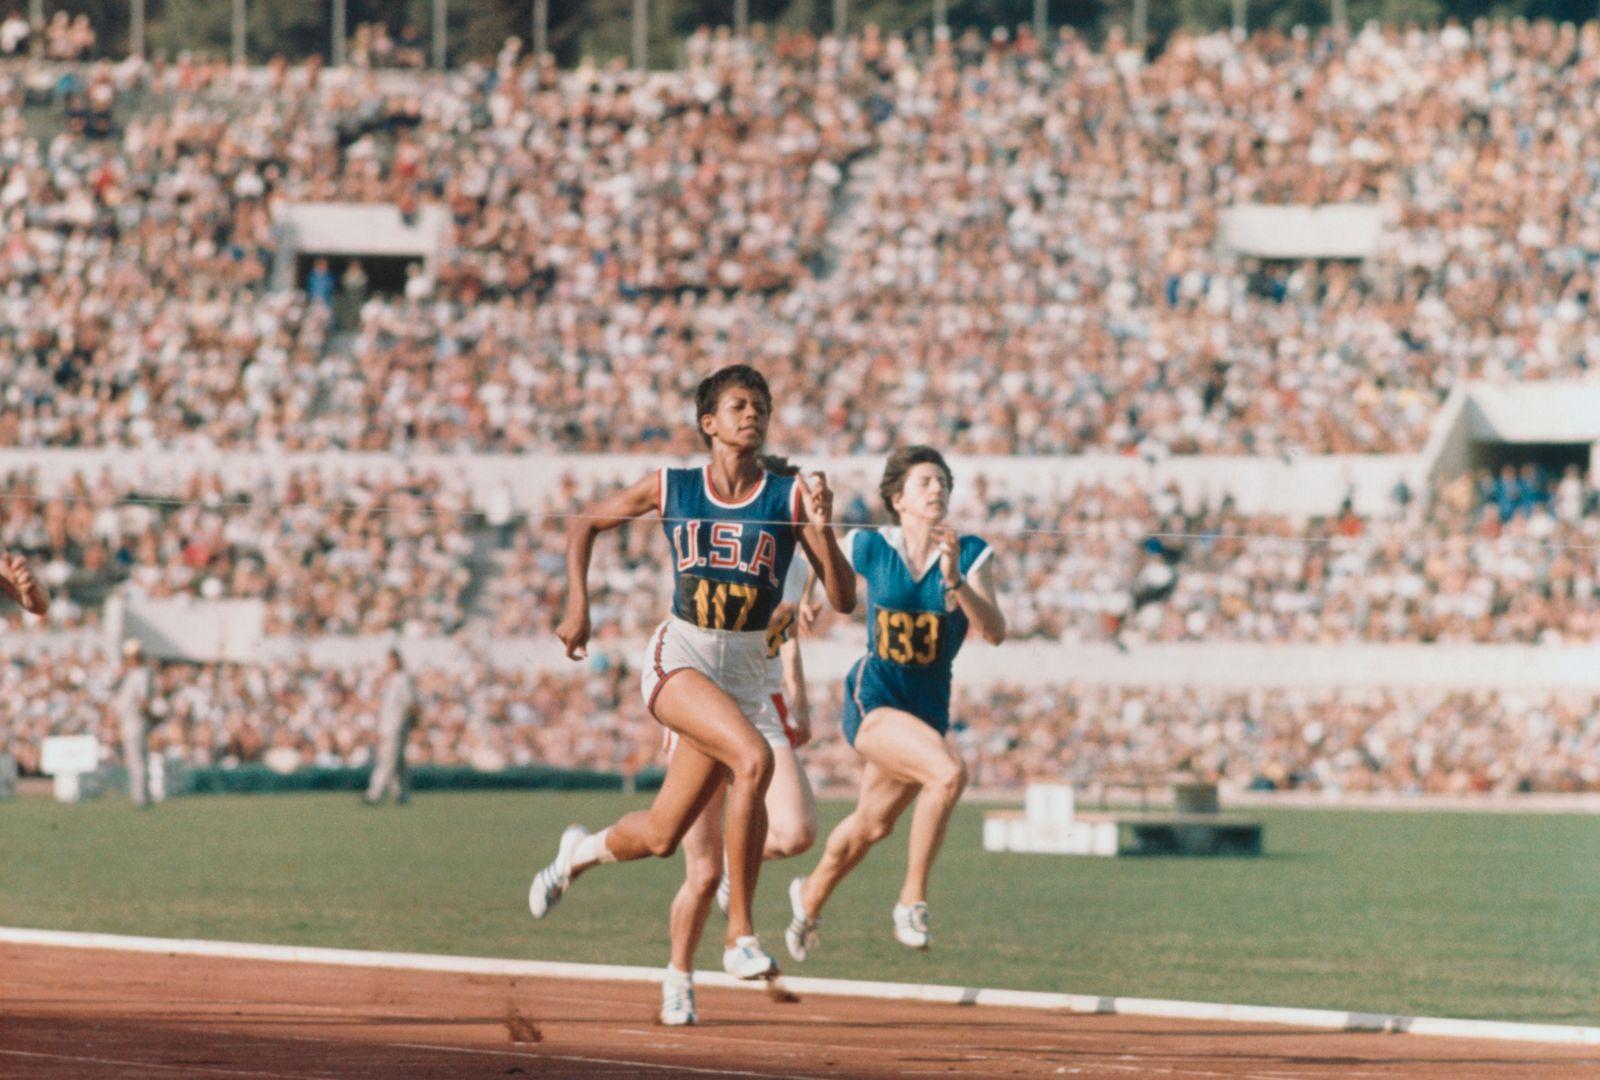 Wilma Rudolph Sprinting in 1960 Summer Olympics